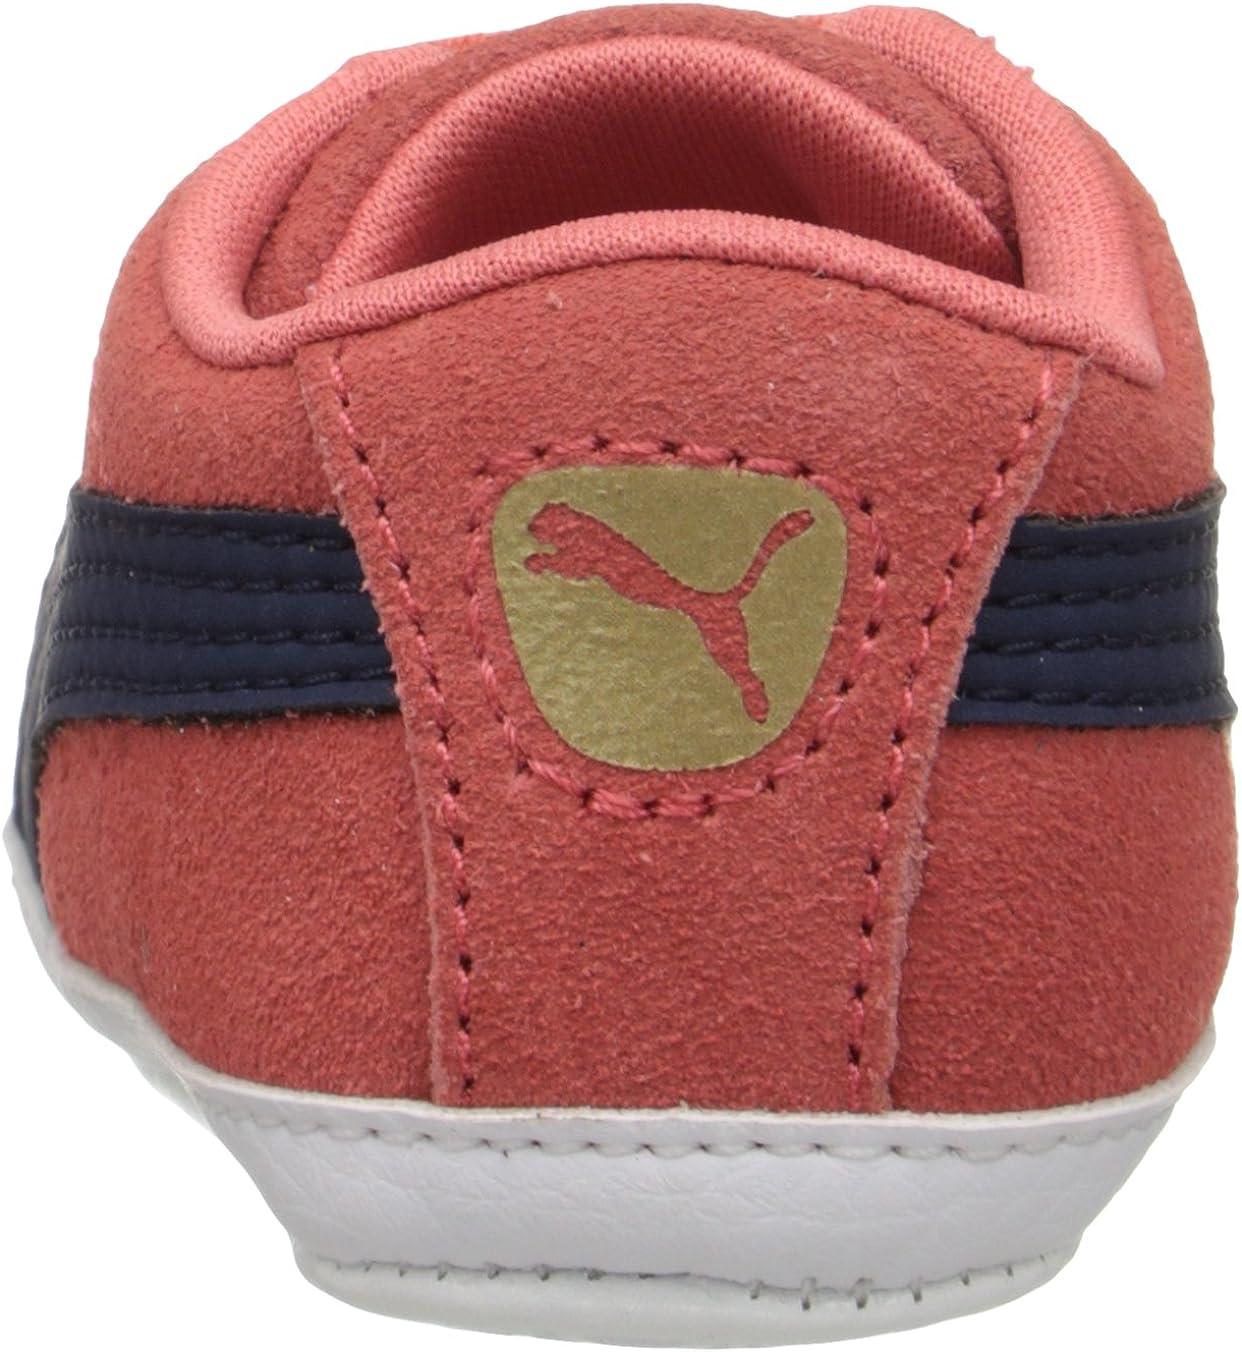 PUMA Suede Crib Shoe Infant//Toddler